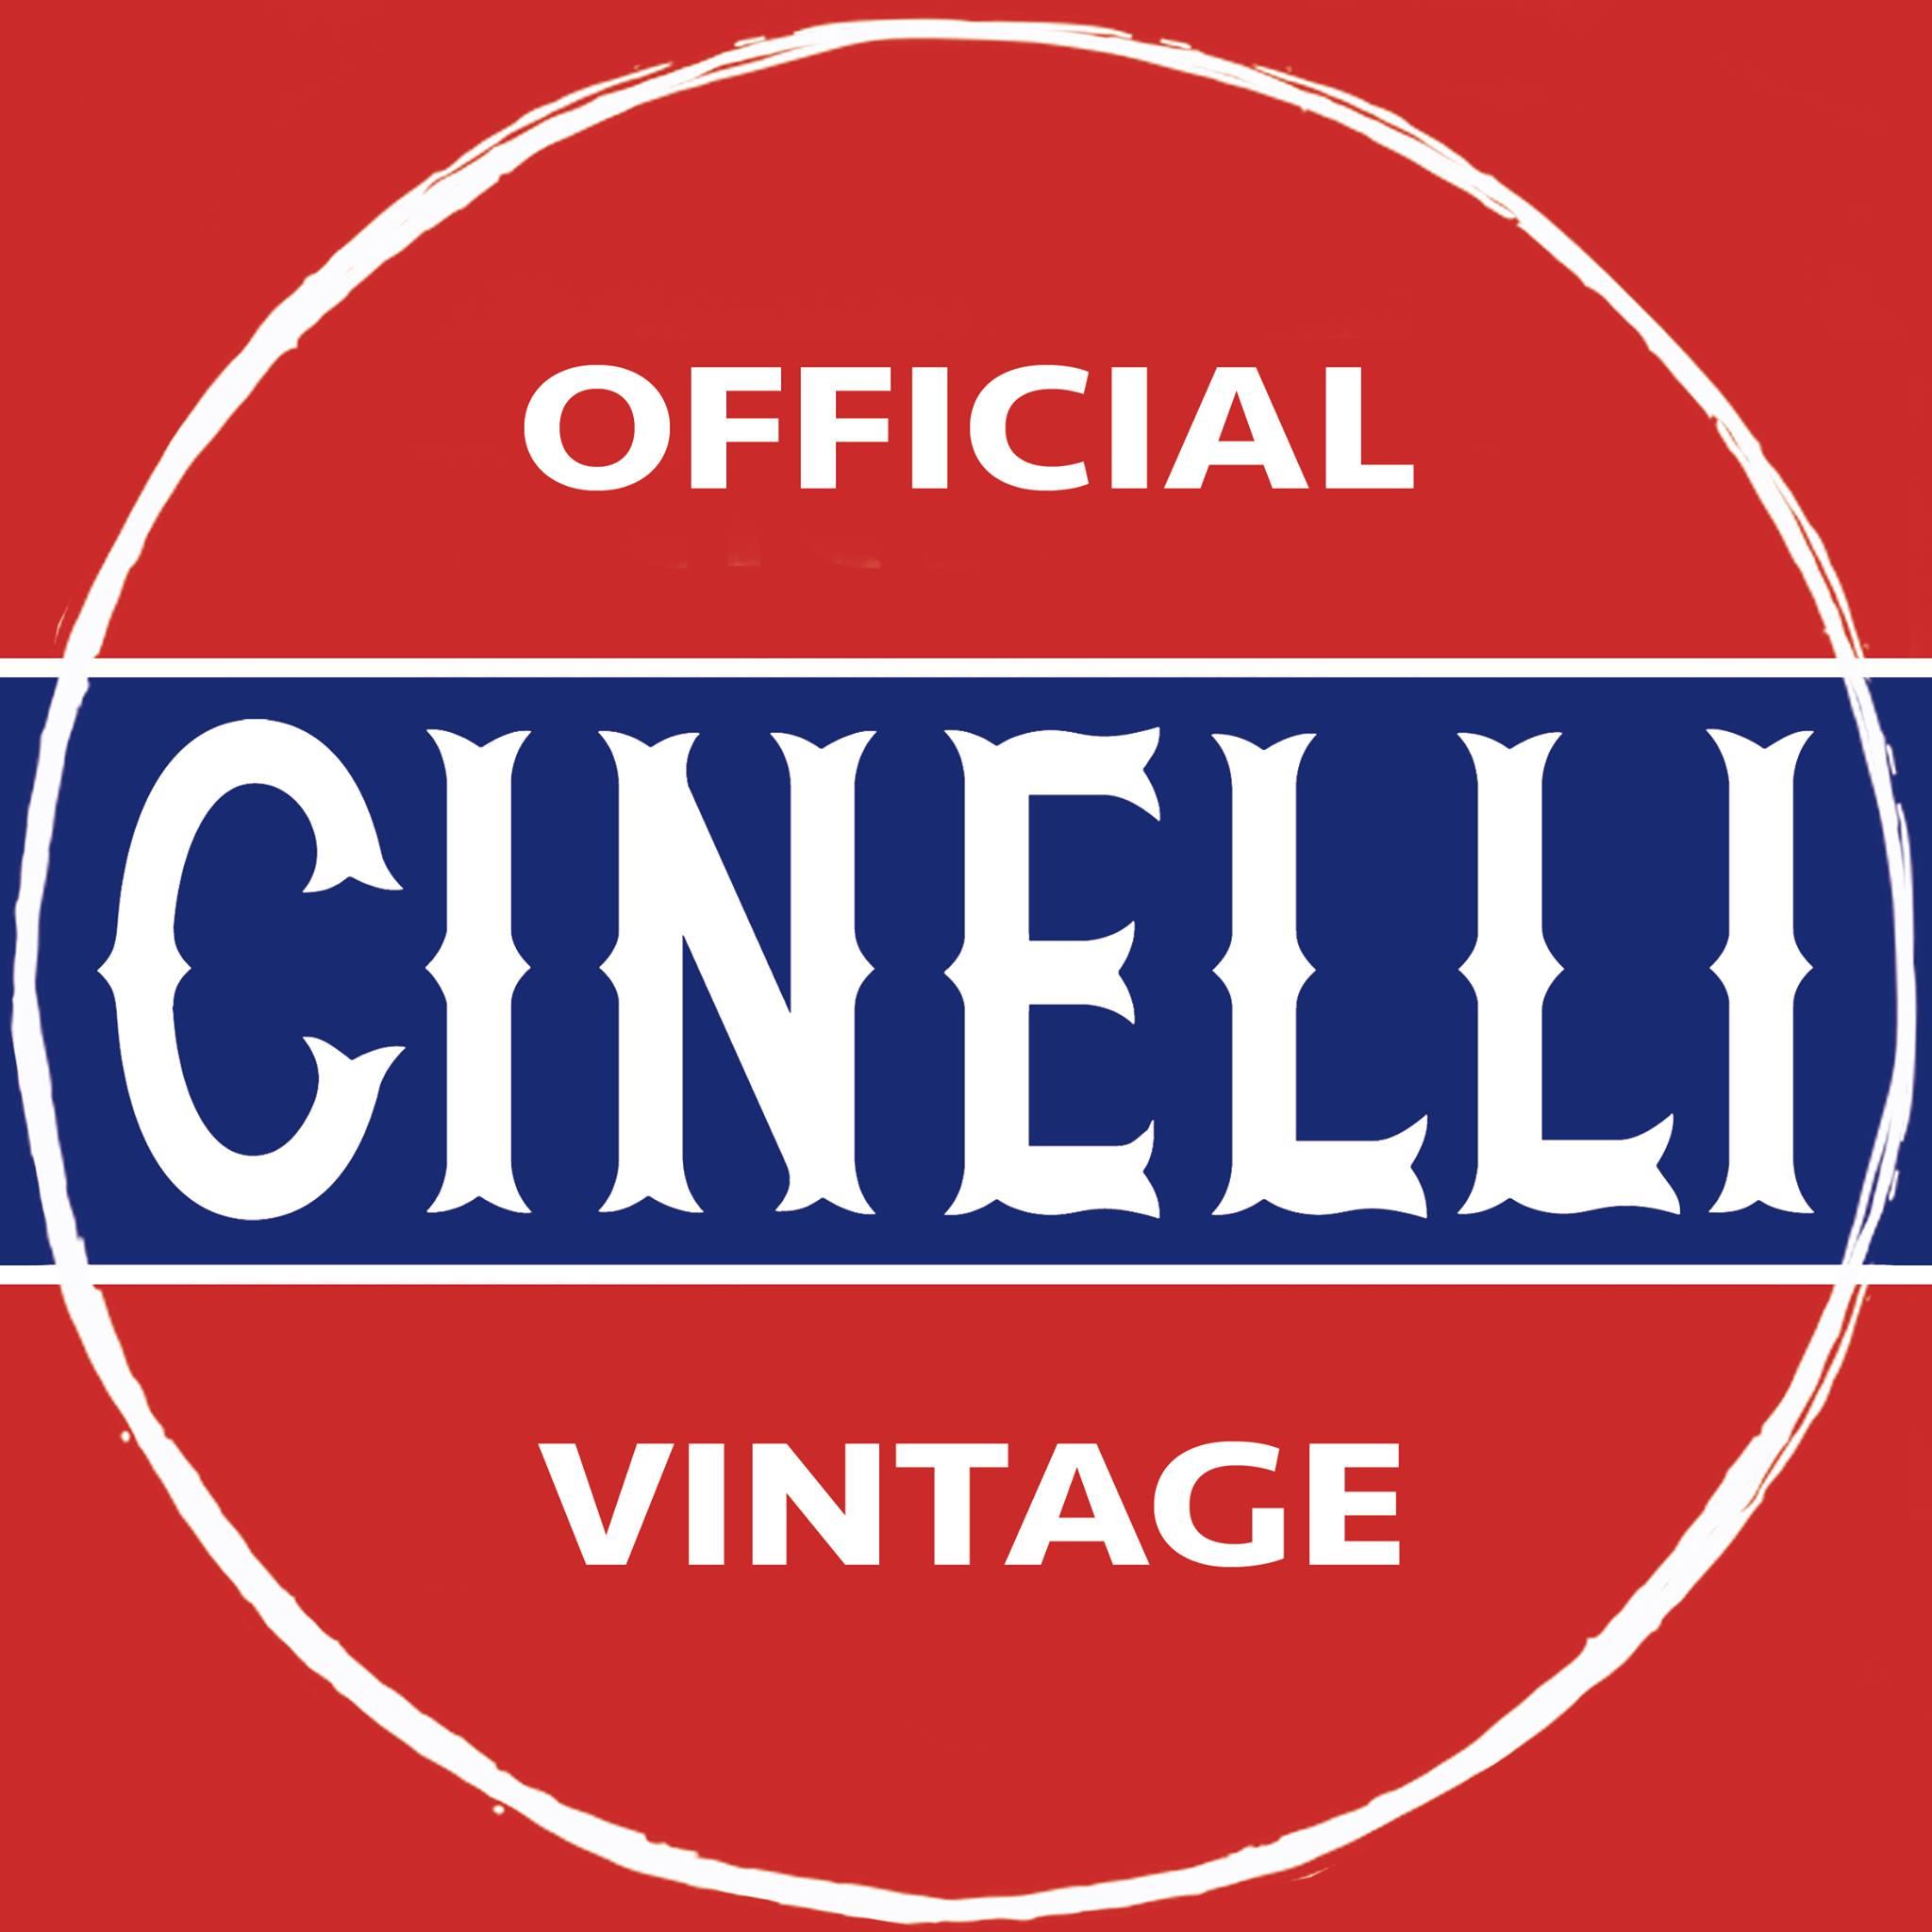 Cinelli Vintage is online!